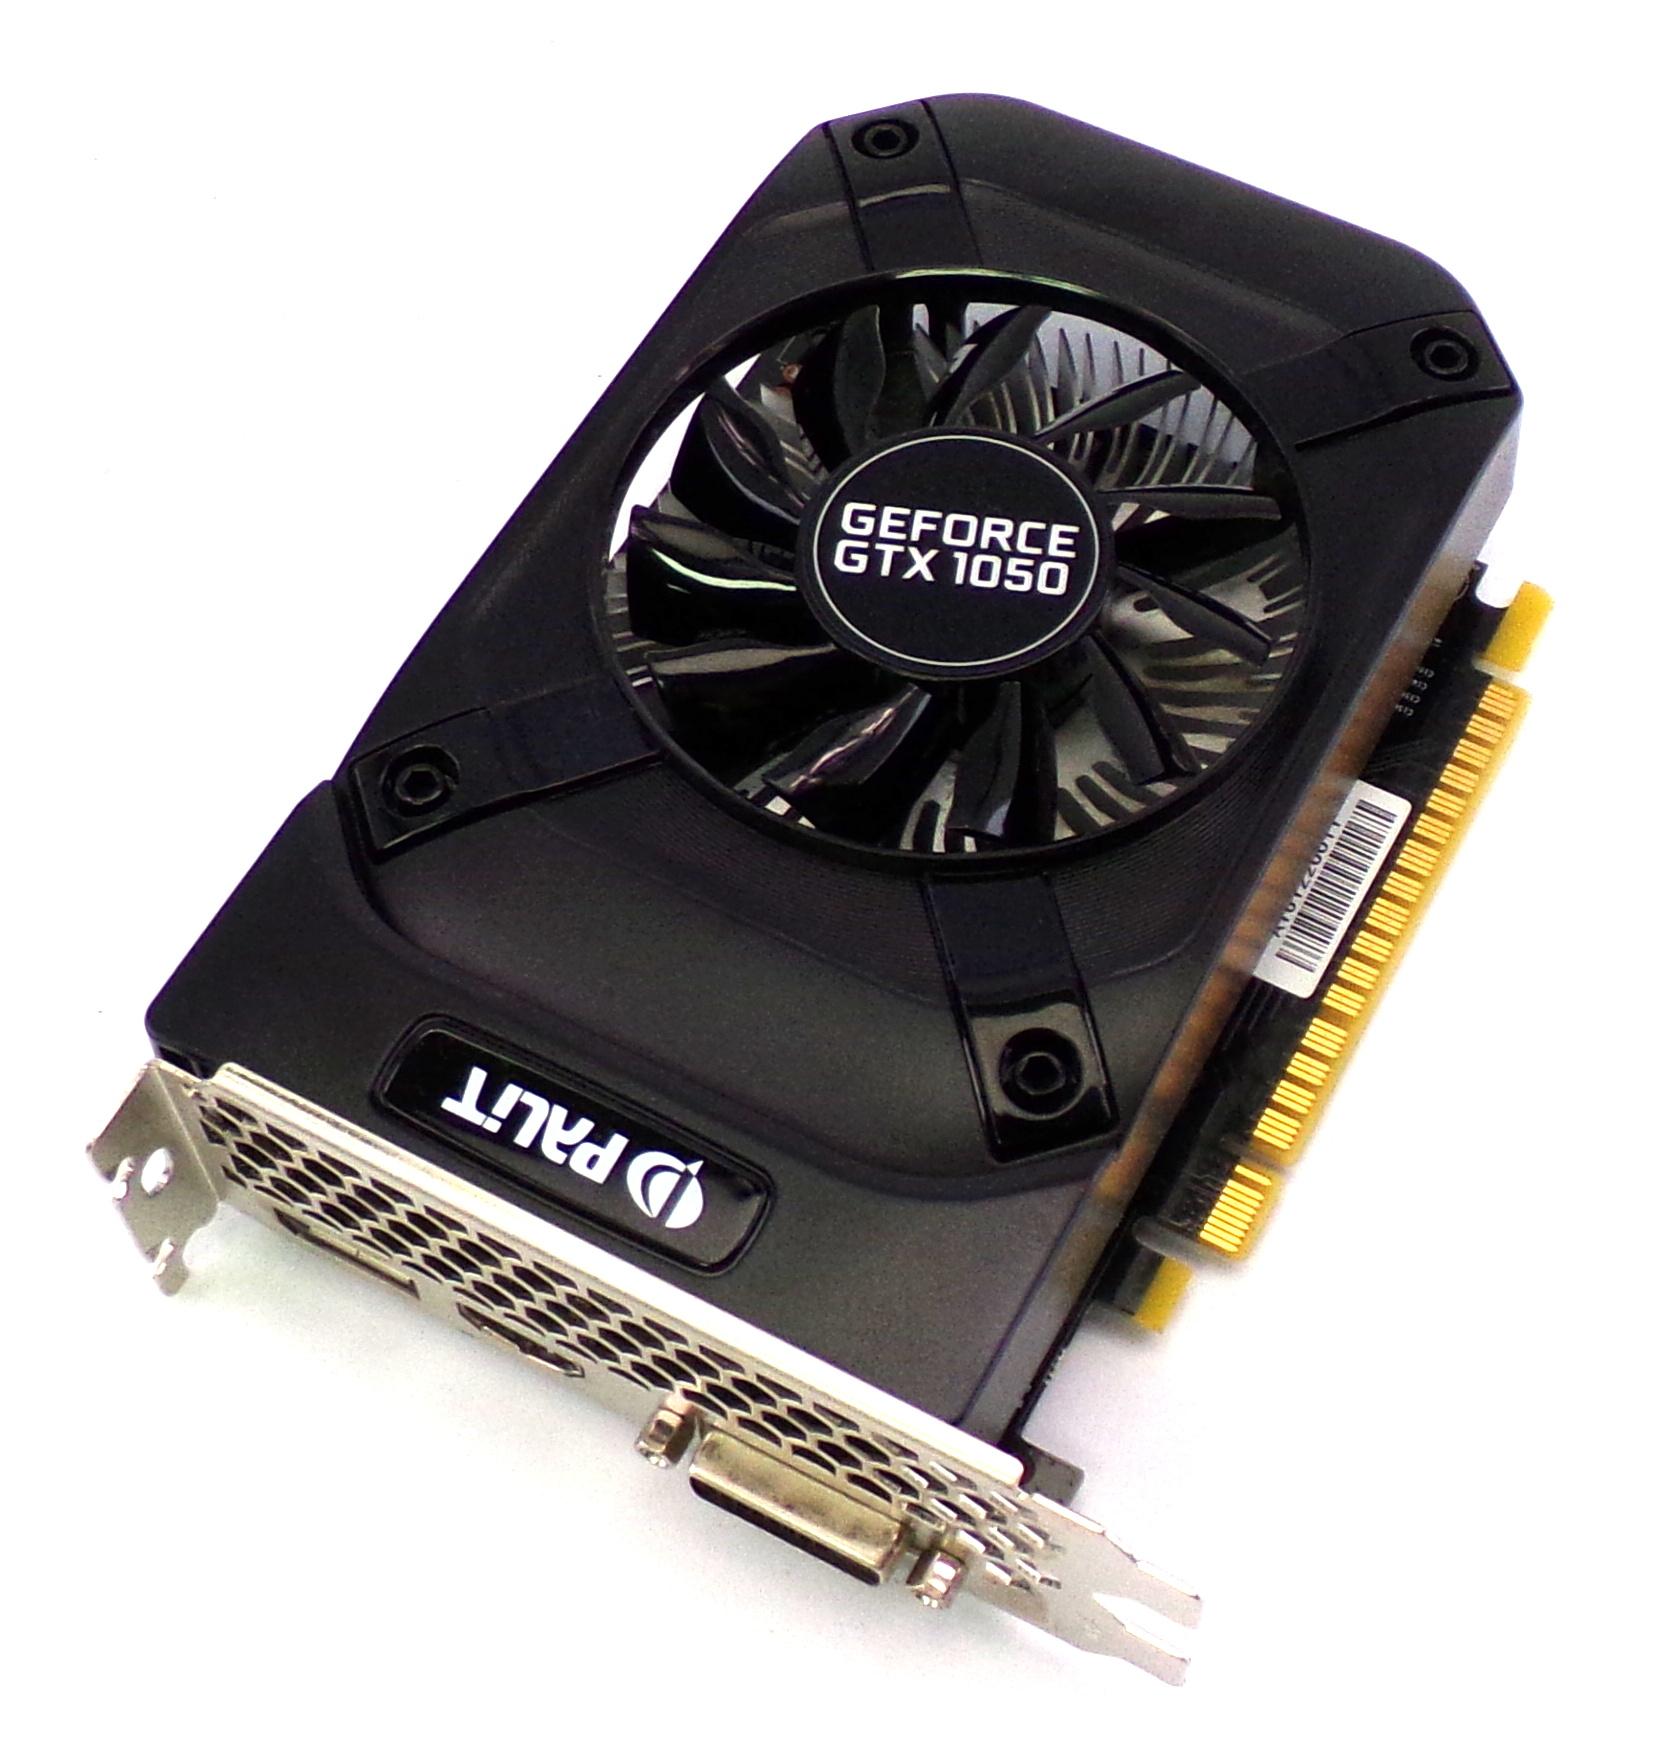 NE5105001841-1070F Palit GTX1050 Ti StormX 2GB DDR5 PCI-e 3 Graphics Card